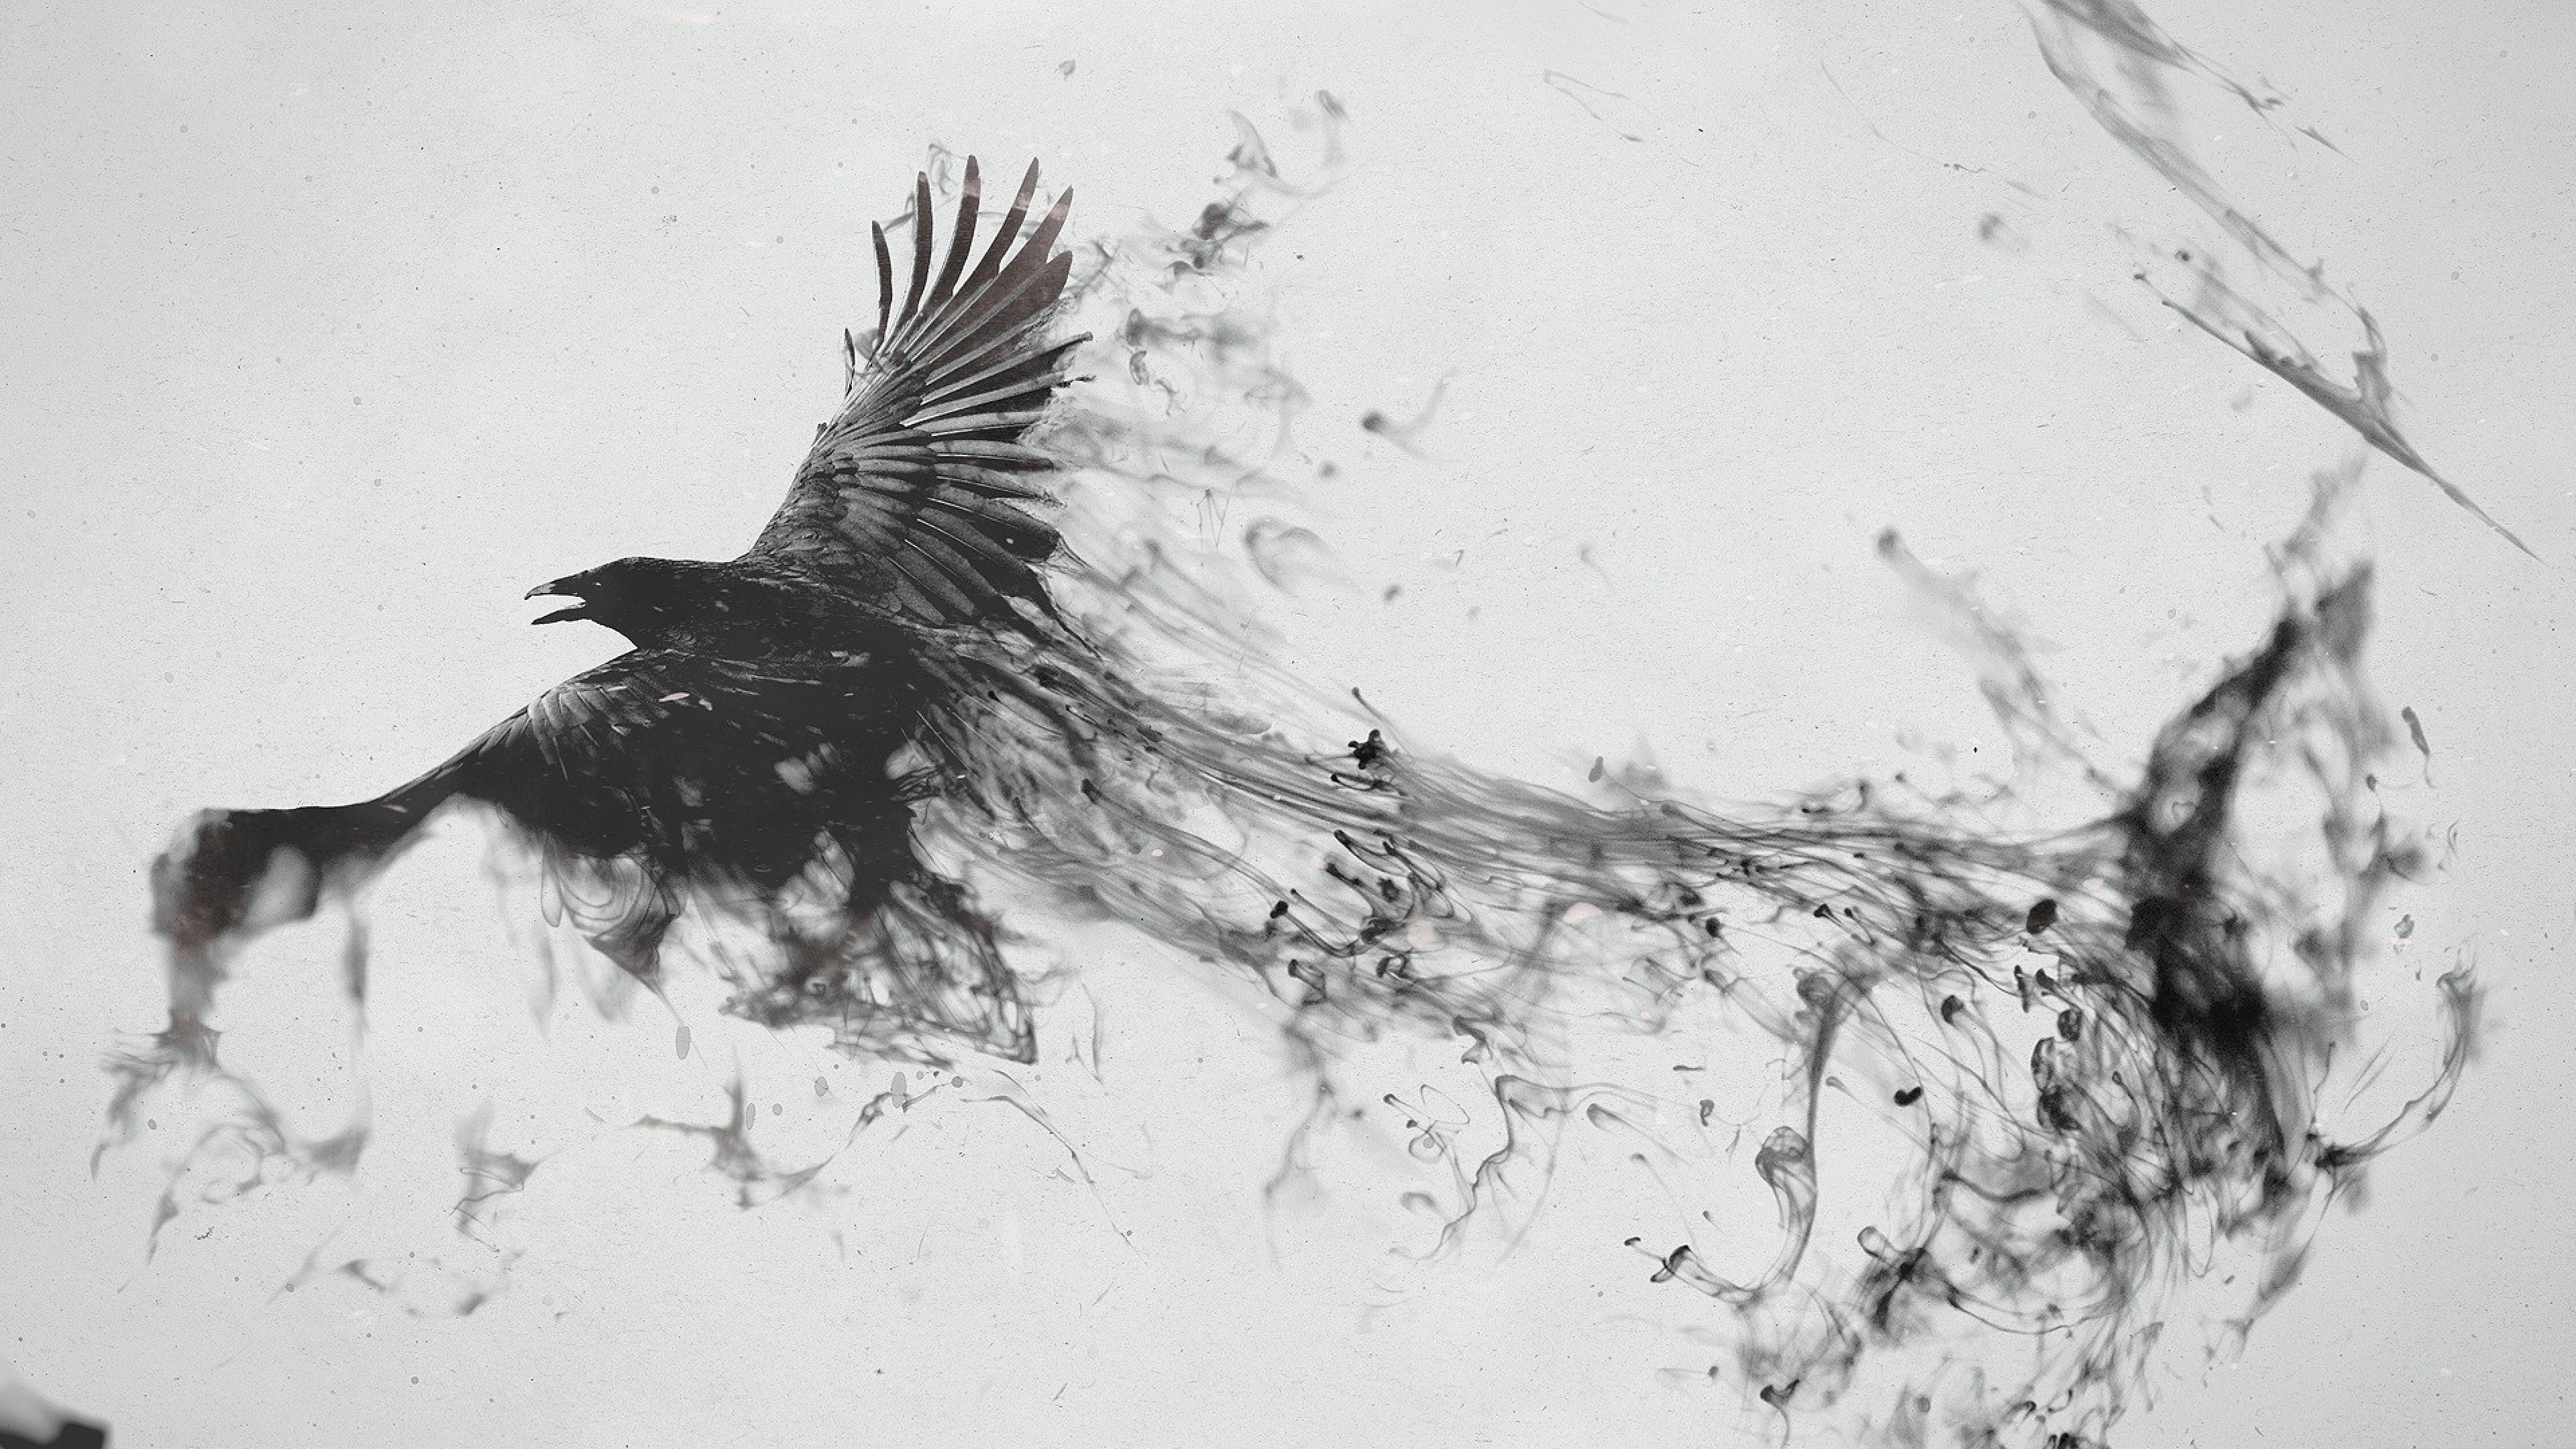 raven bird art 4k 1540748383 - Raven Bird Art 4k - raven wallpapers, digital art wallpapers, bird wallpapers, artist wallpapers, art wallpapers